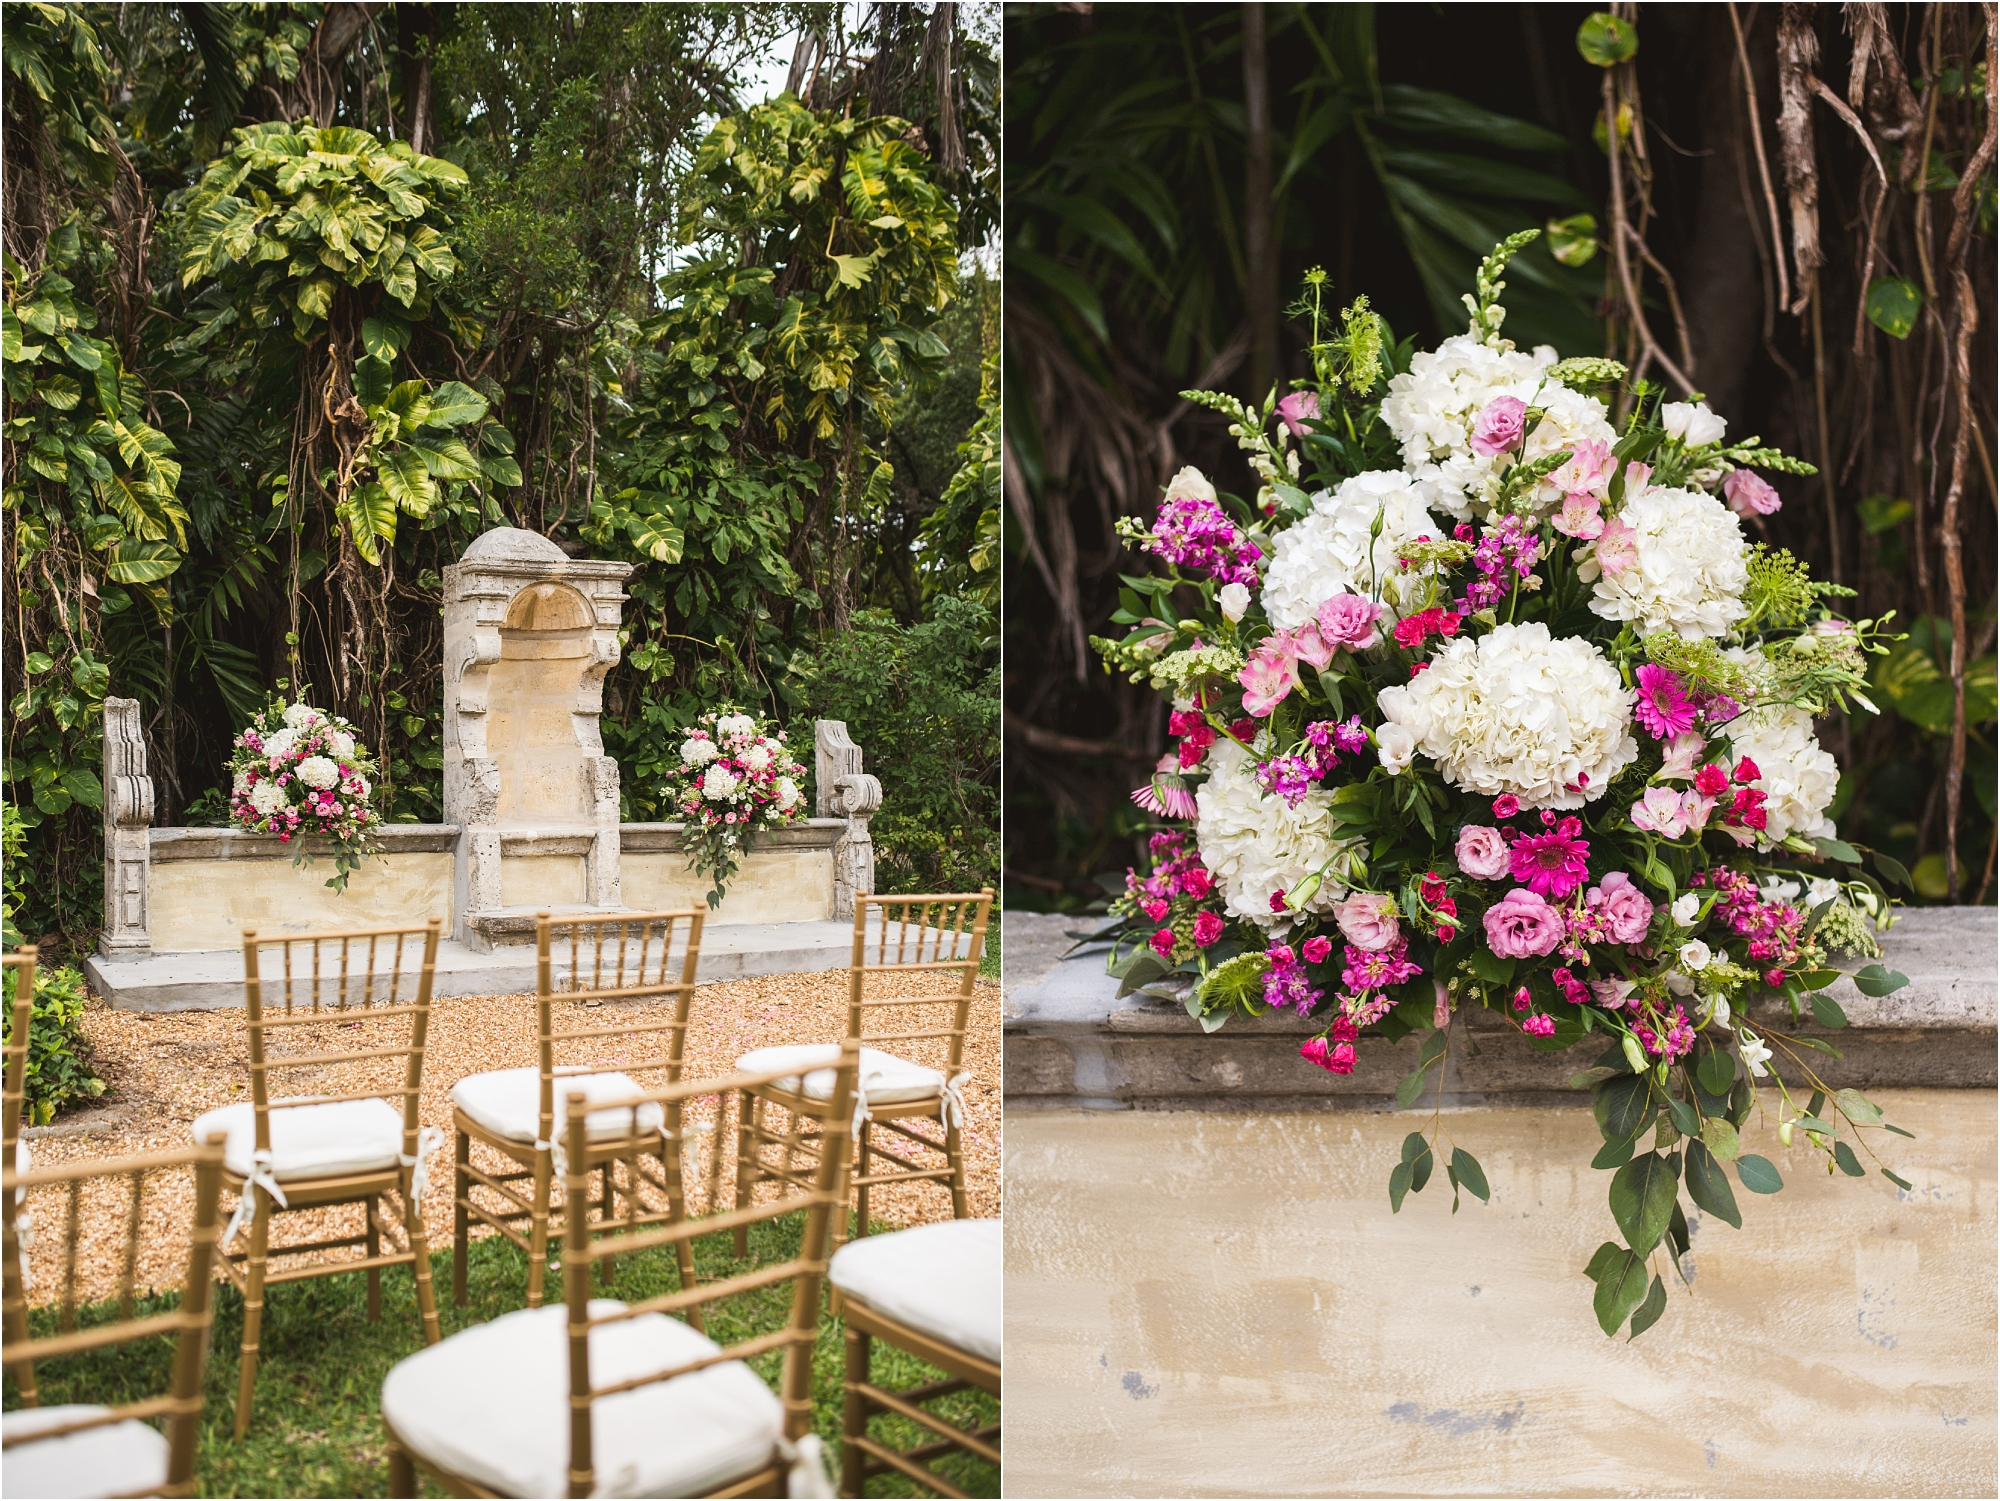 Spanish-Monastery-miami-beach-outdoor-elegant-wedding-photographer-jessenia-gonzalez_1130.jpg